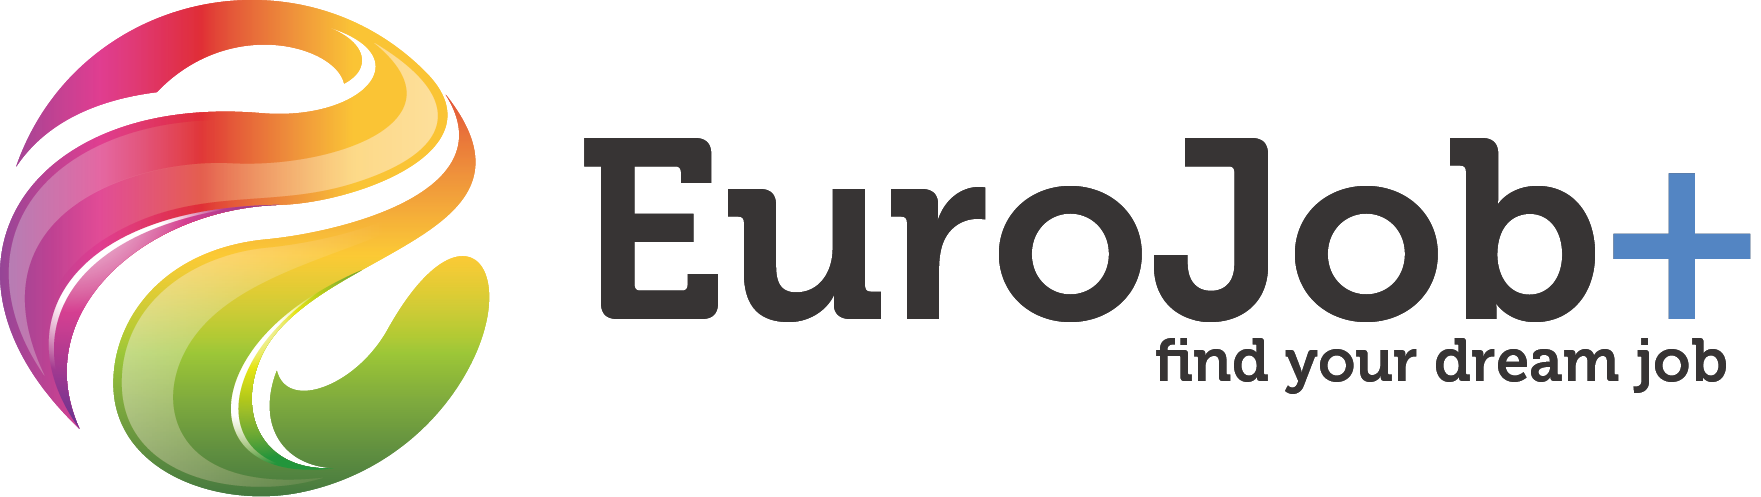 EuroJob+